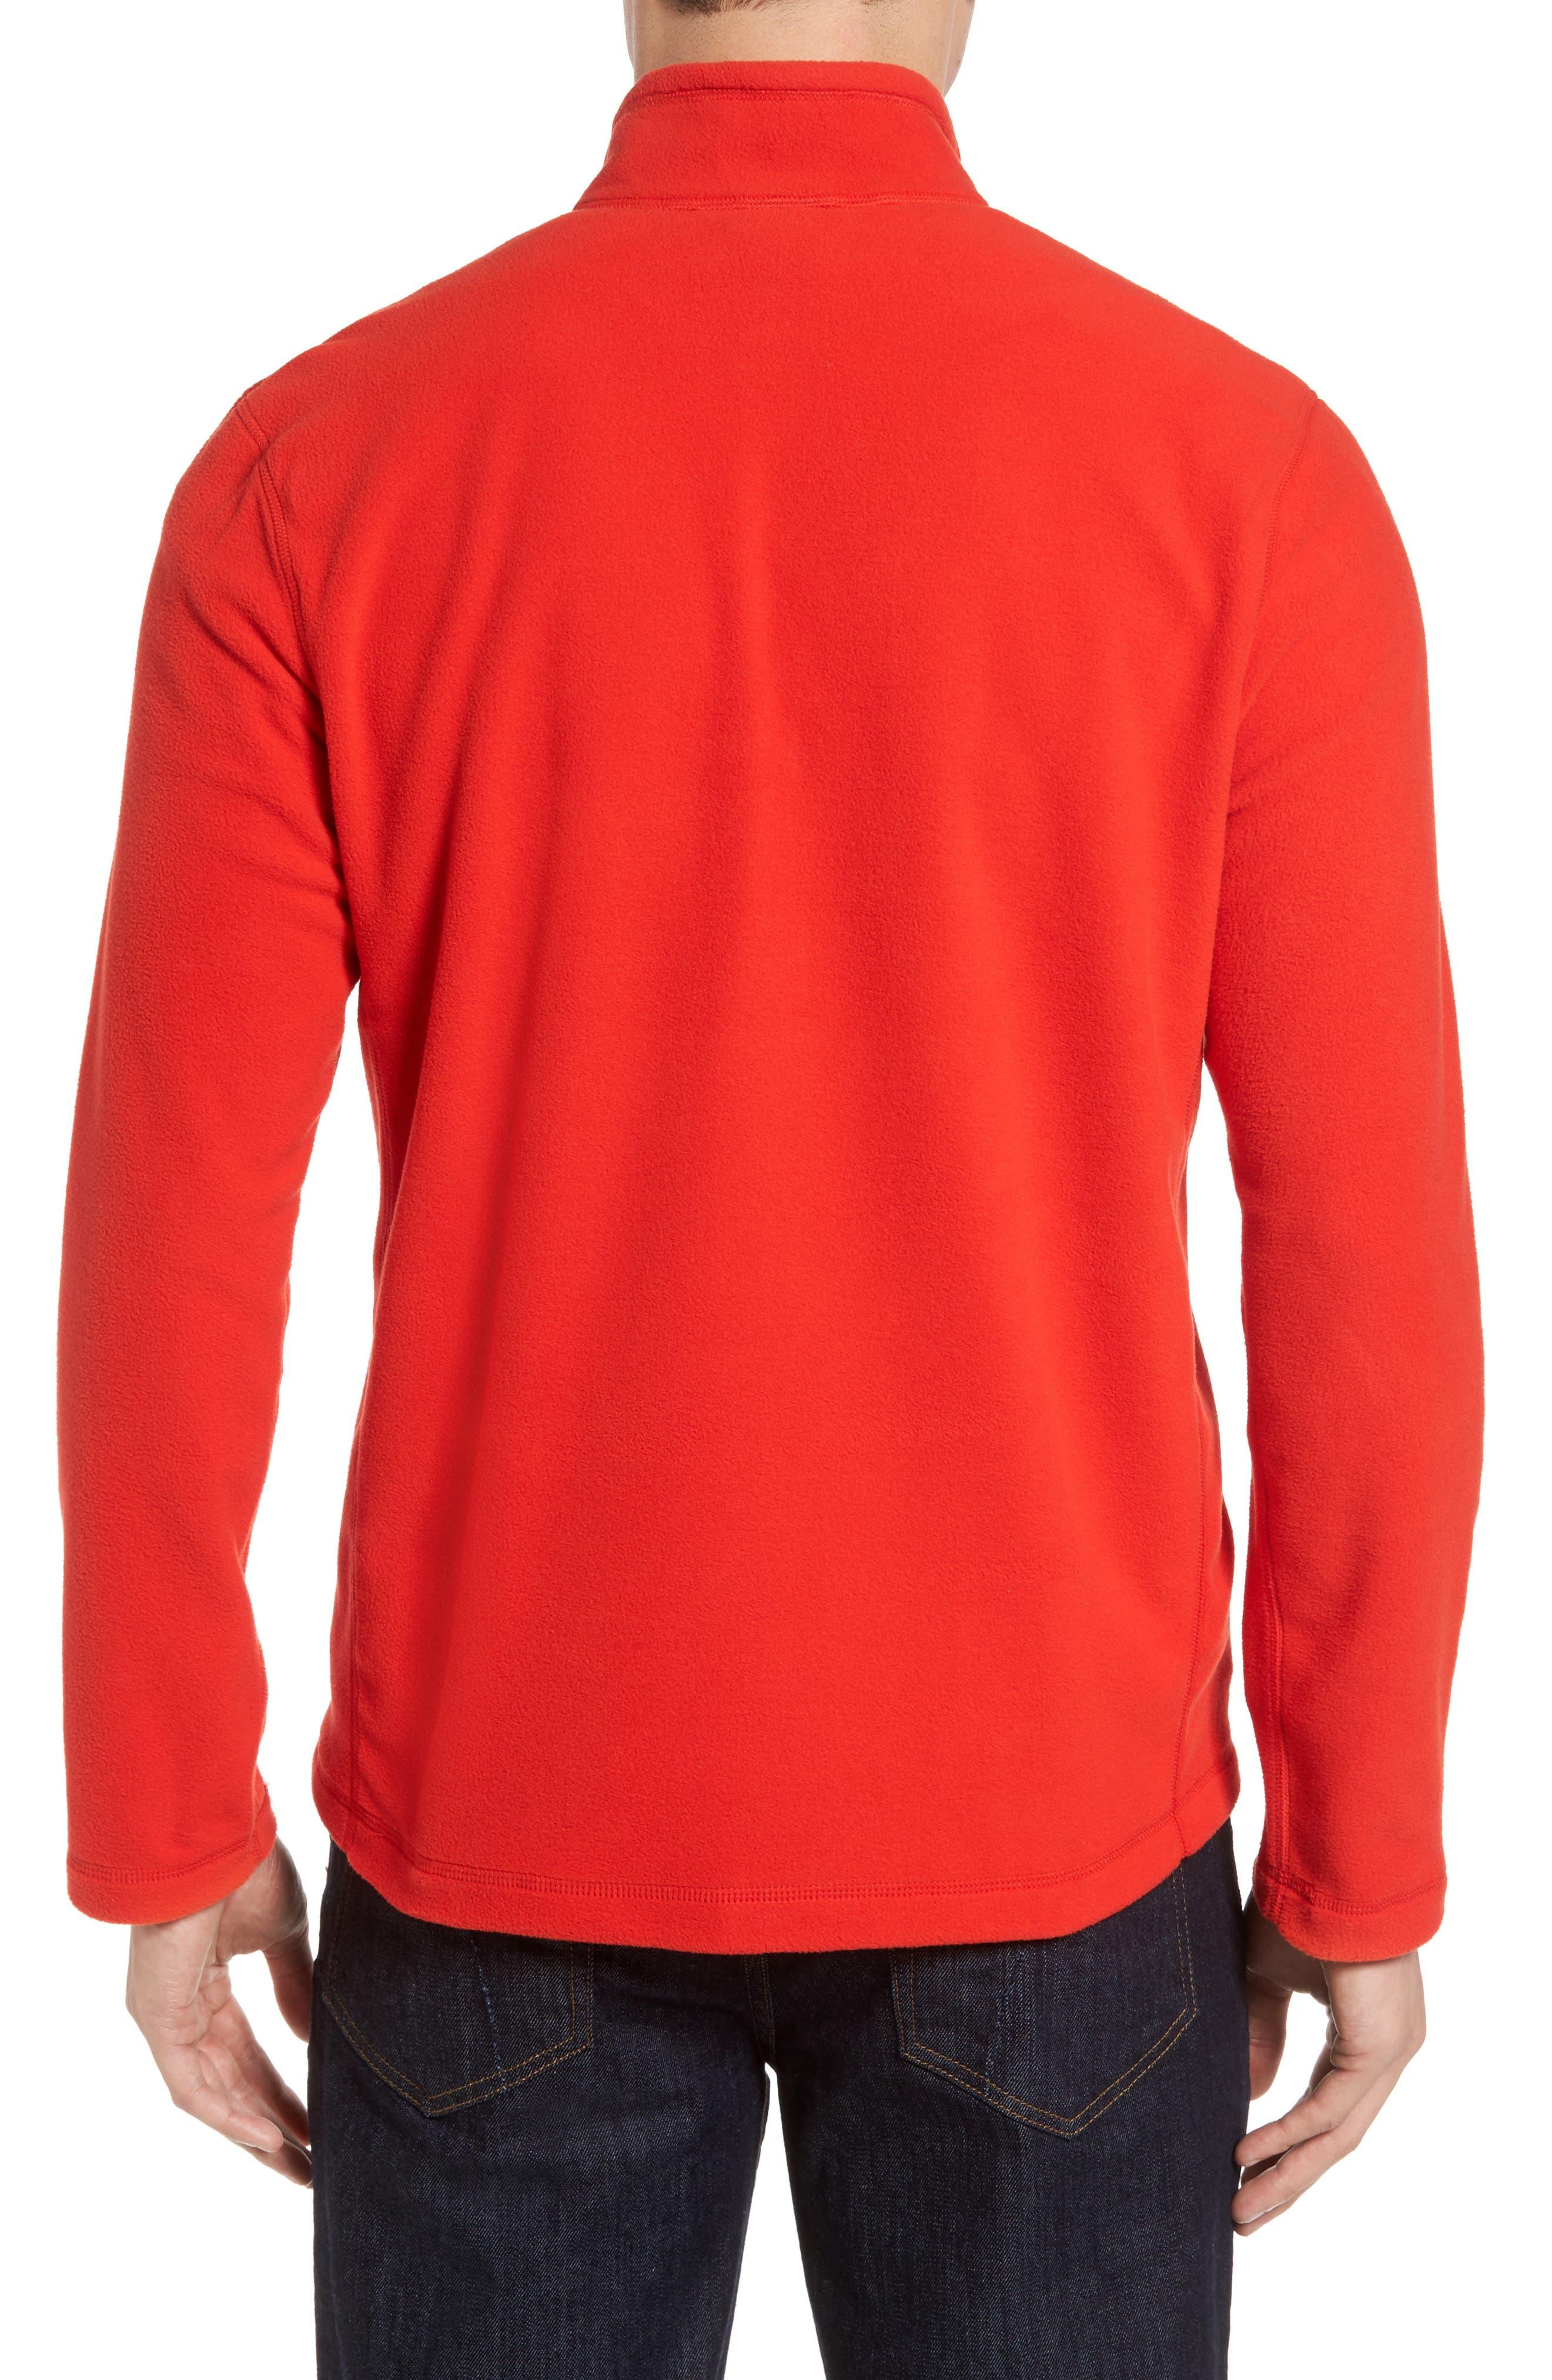 'TKA 100 Glacier' Quarter Zip Fleece Pullover,                             Alternate thumbnail 88, color,